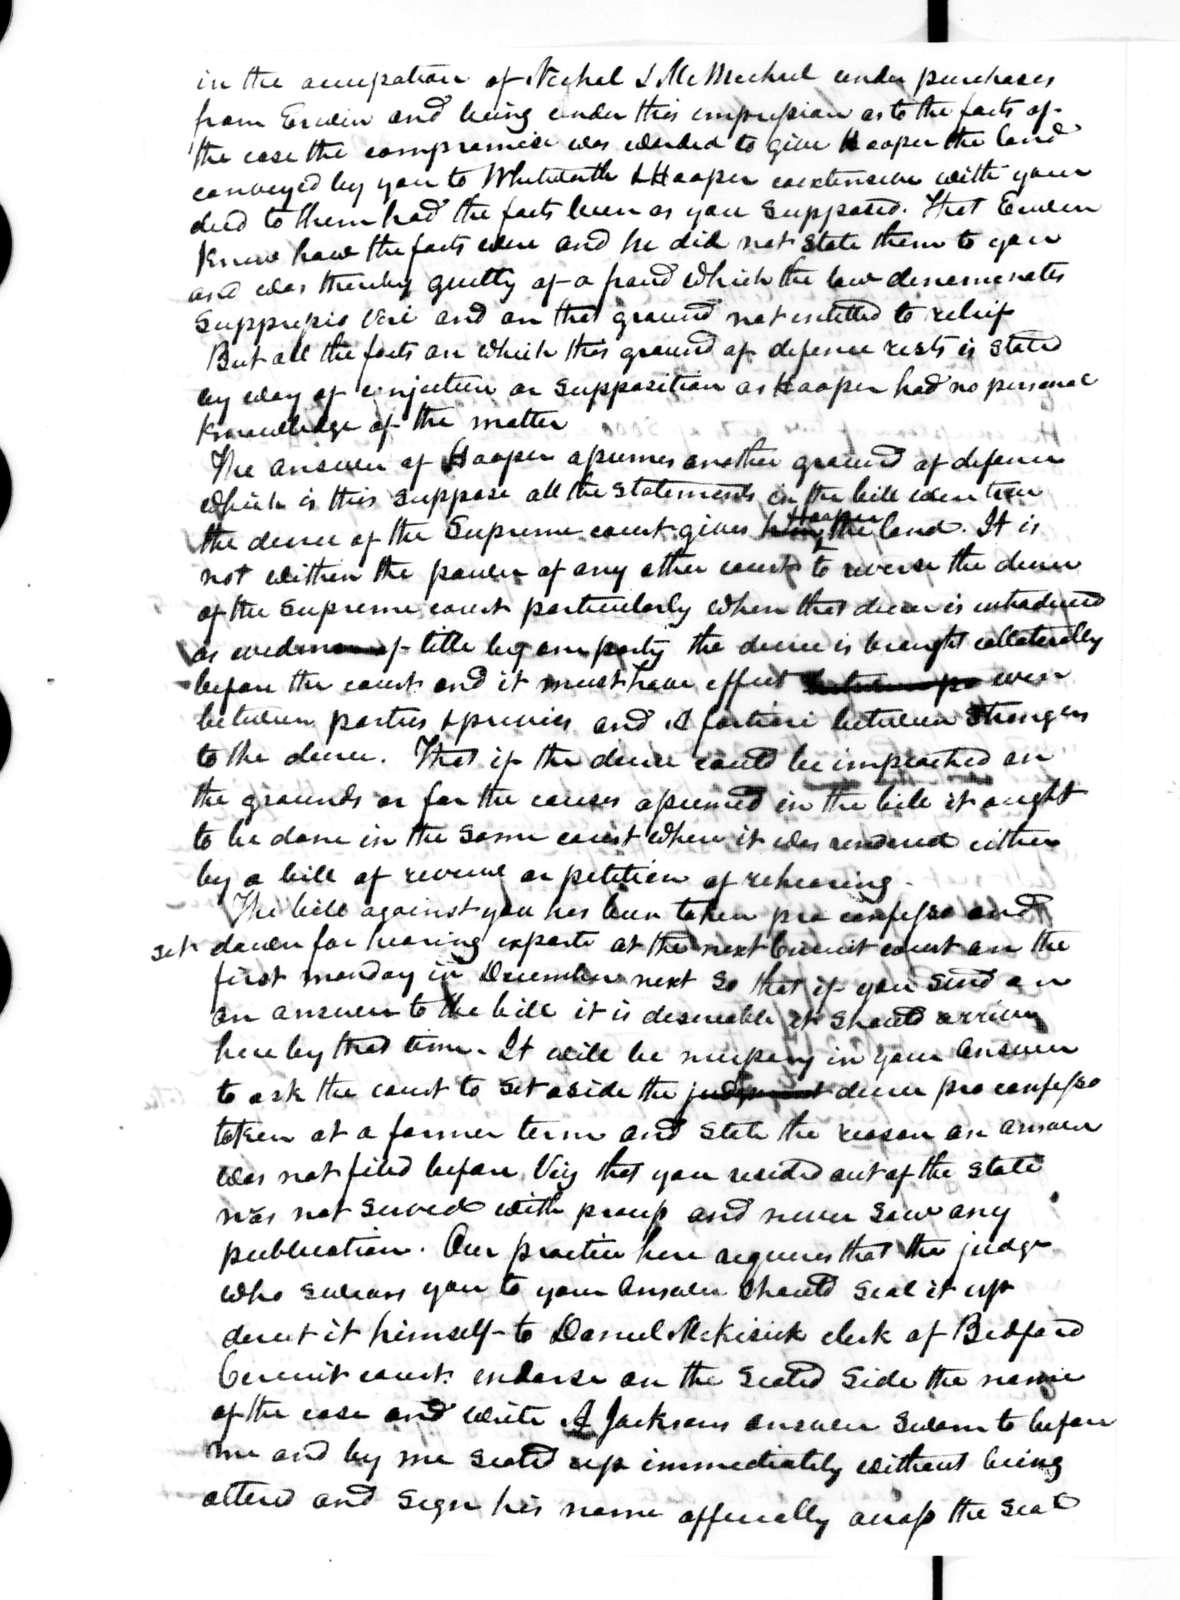 Samuel Anderson to Andrew Jackson, November 6, 1832